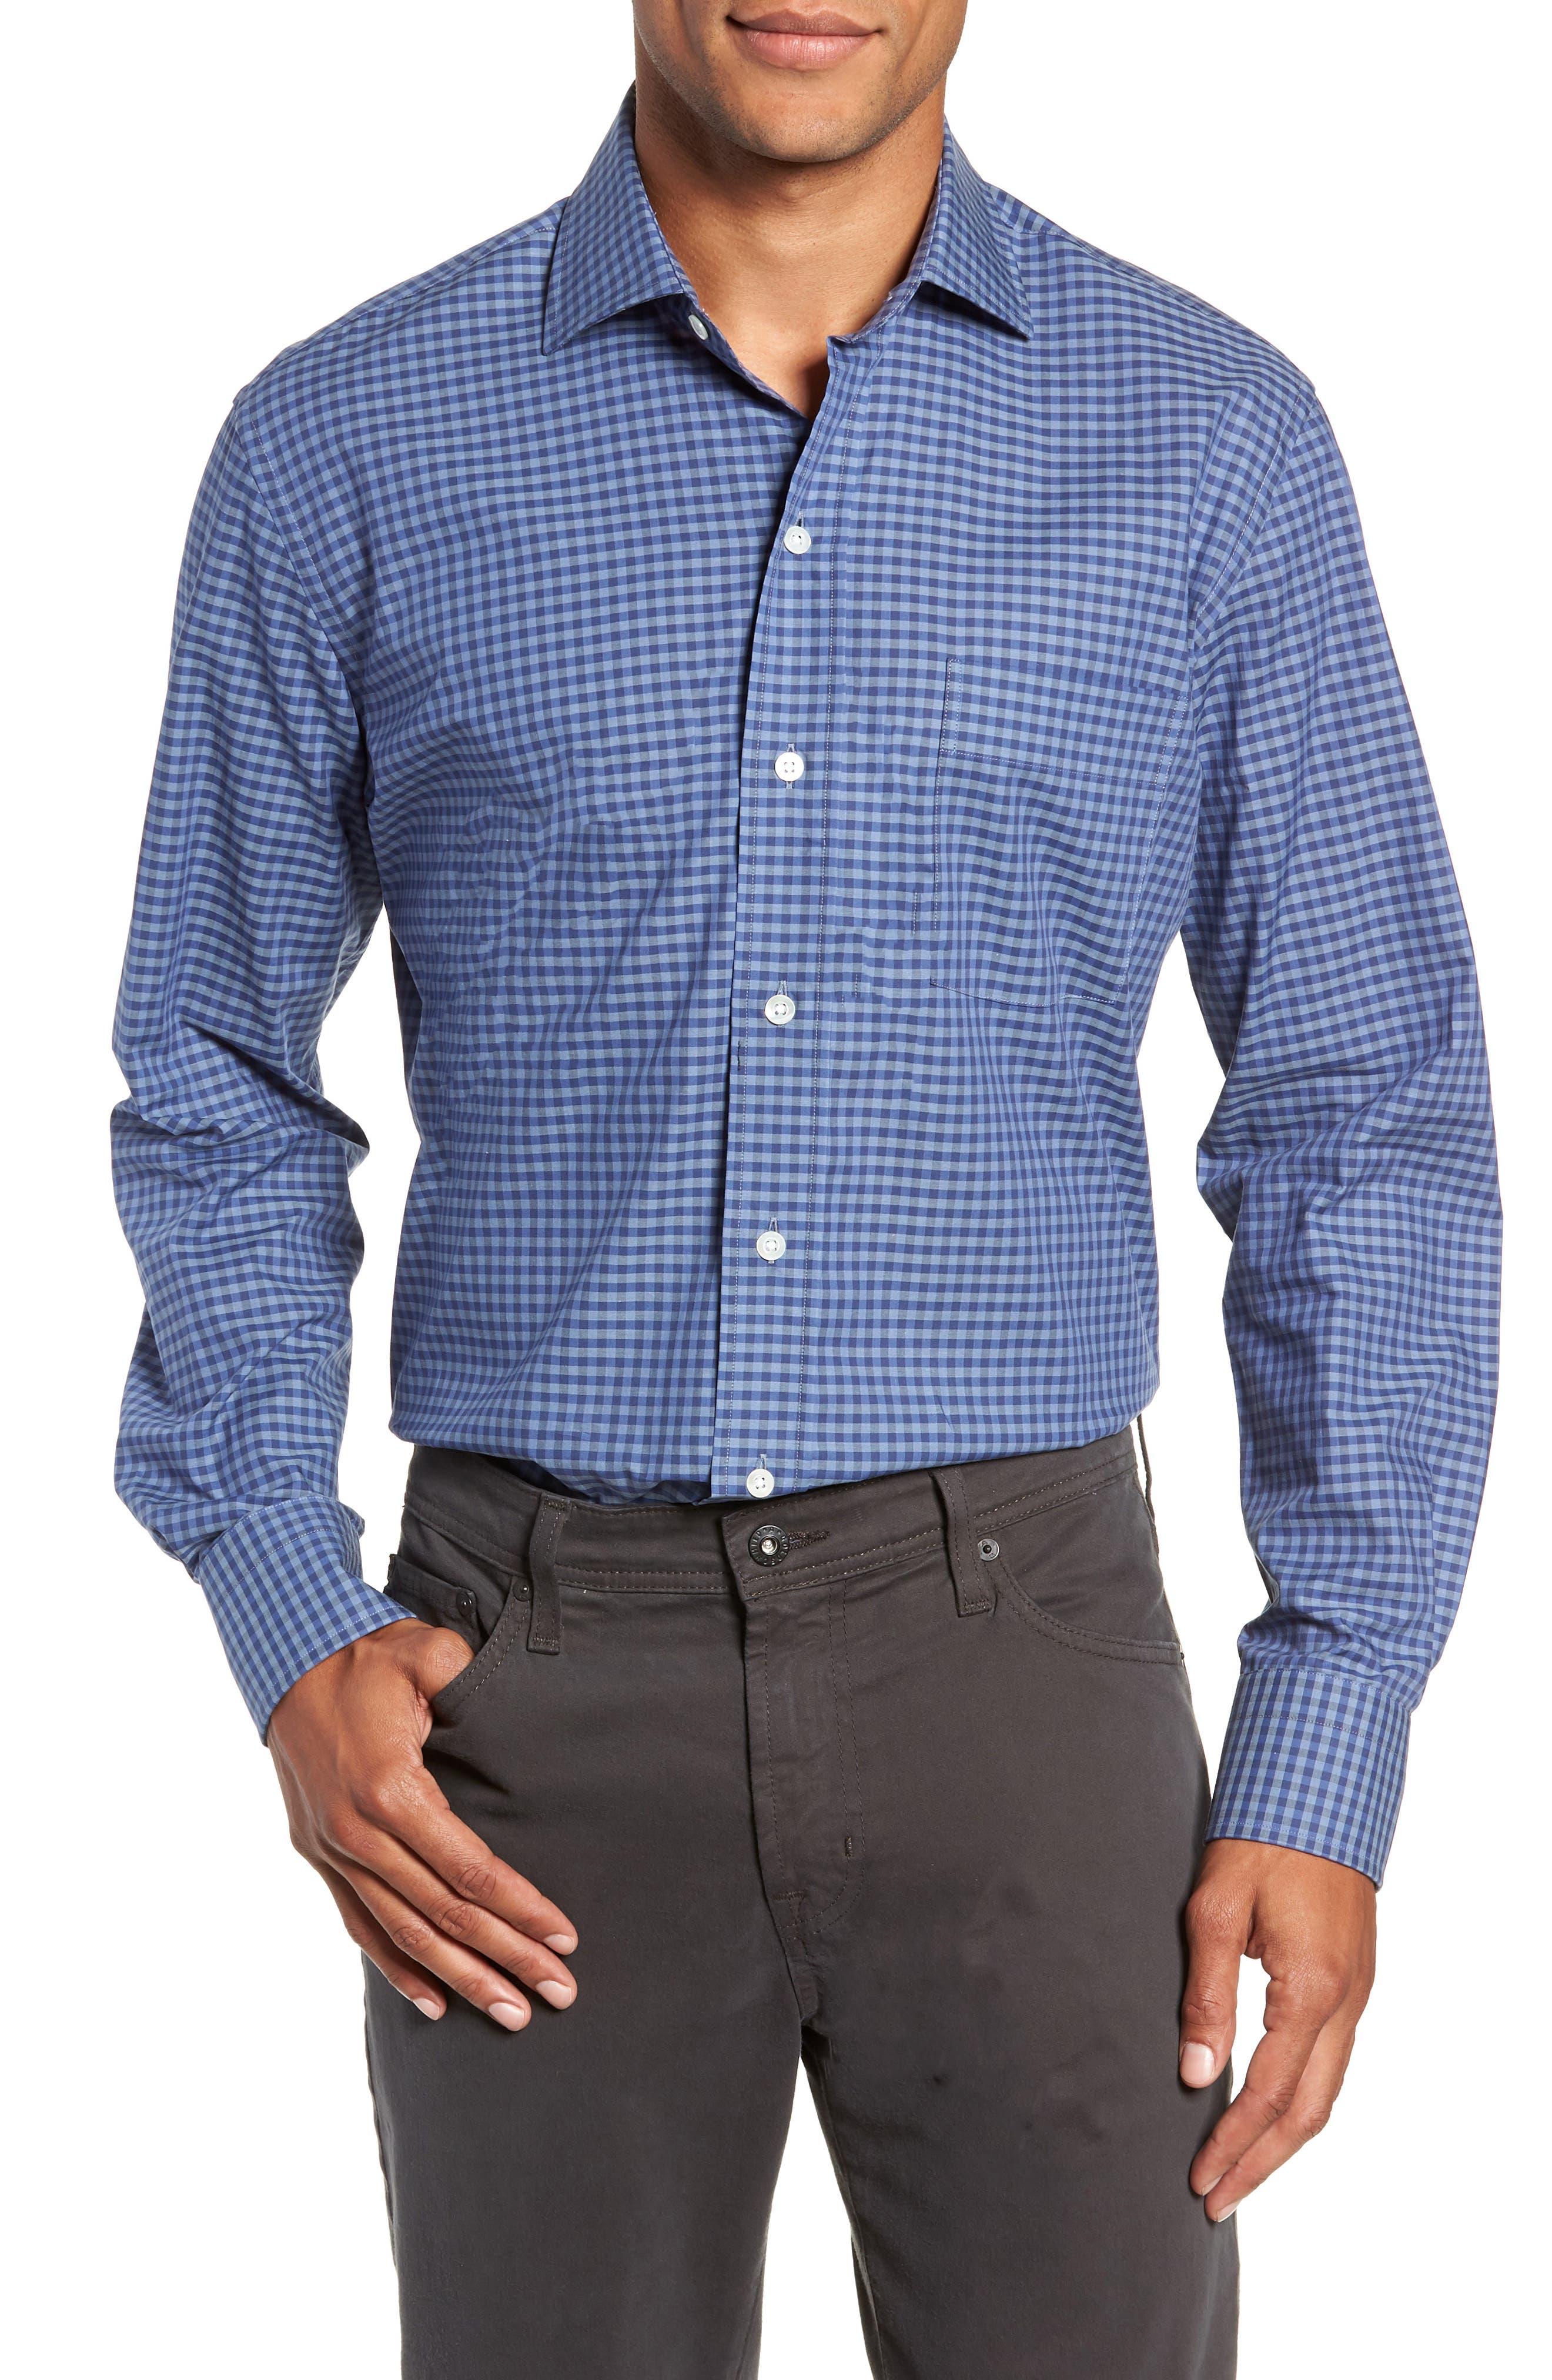 Fairlee Gingham Slim Fit Dress Shirt in Dark Blue